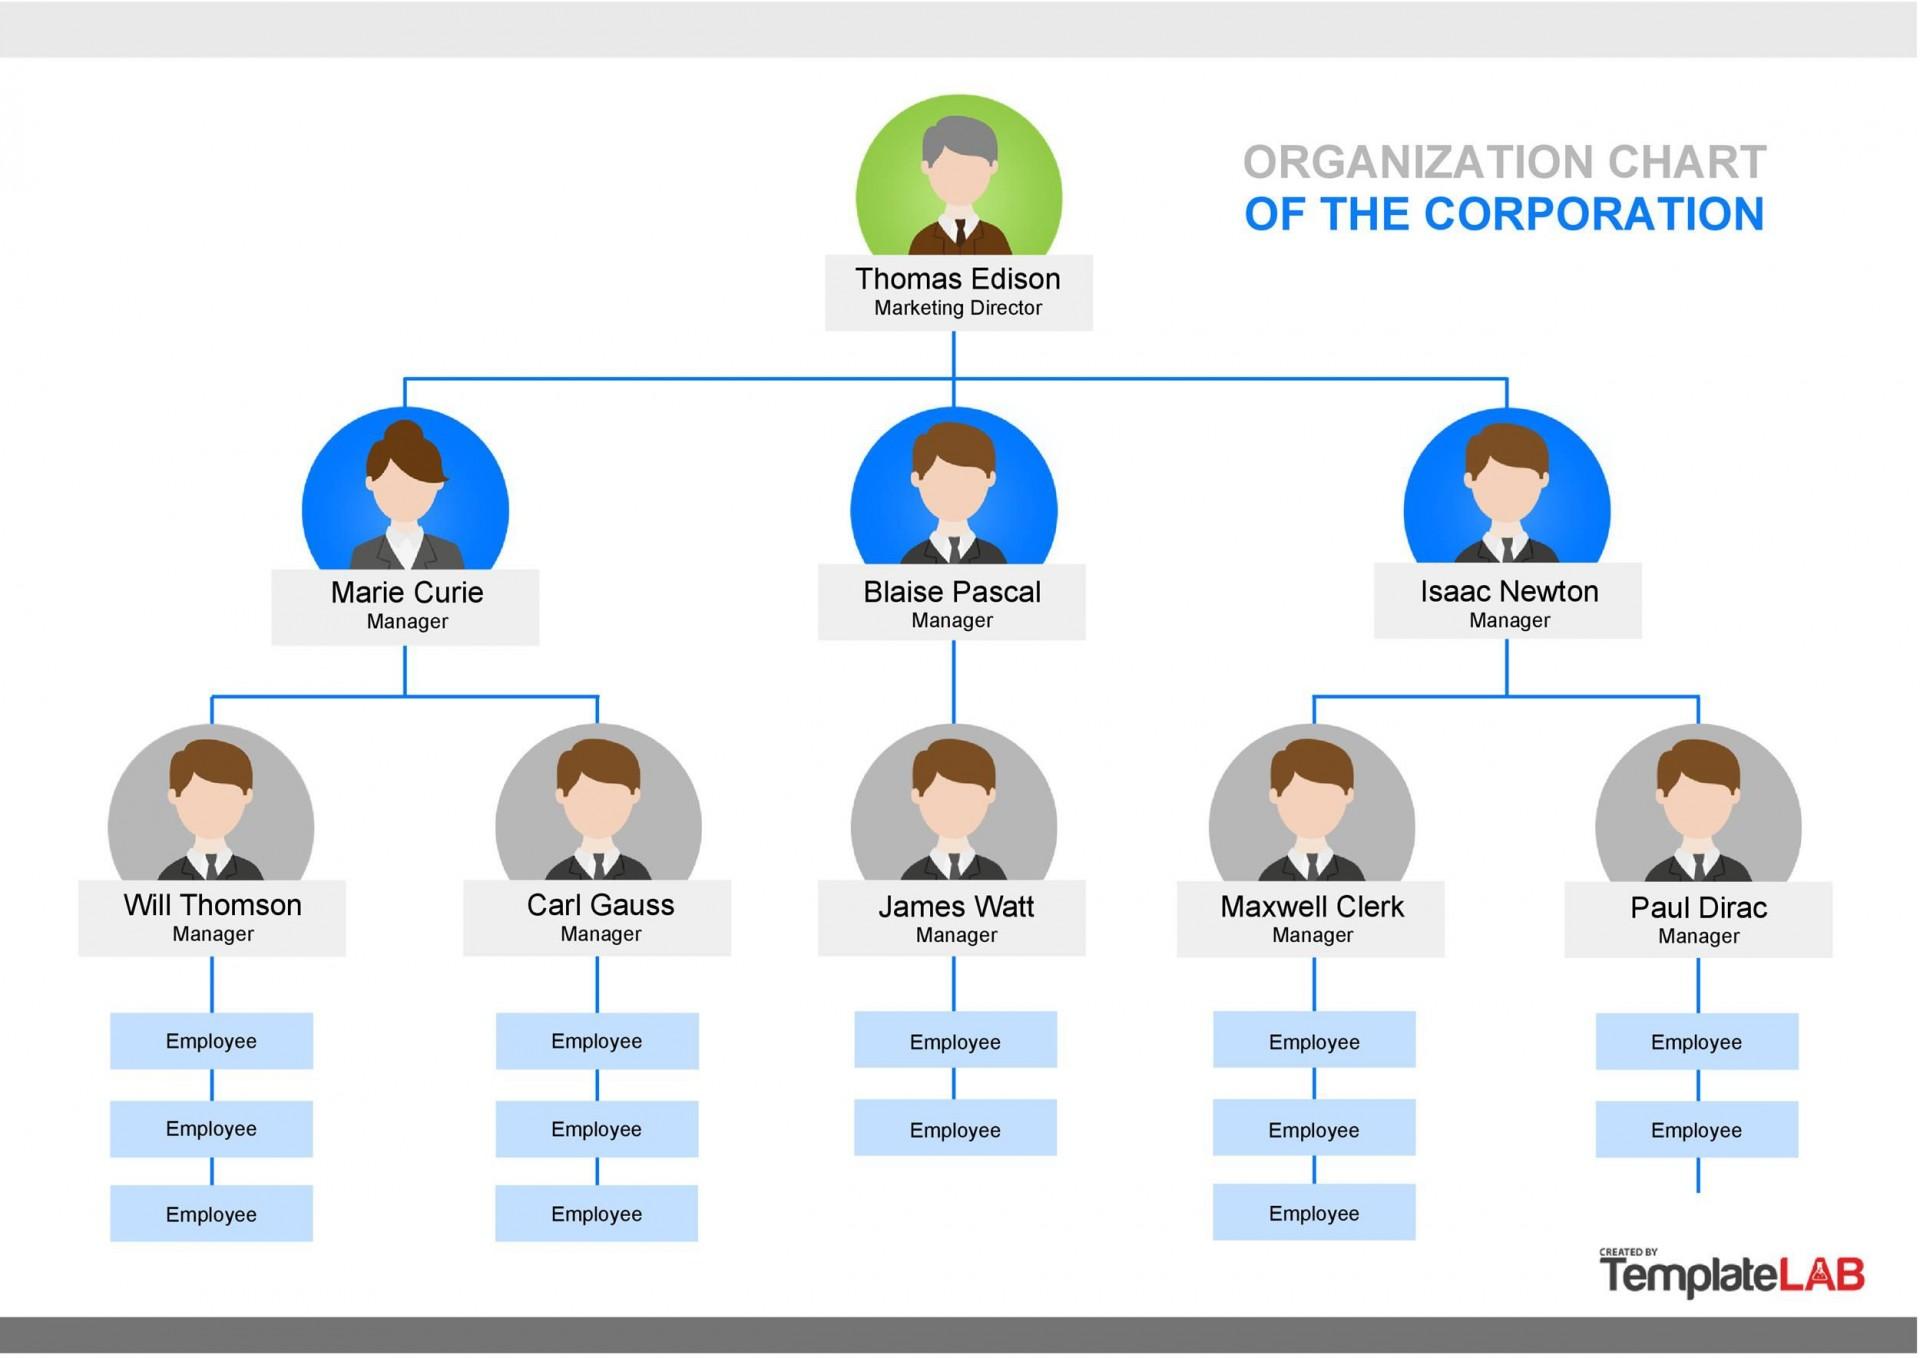 004 Shocking Microsoft Word Organization Chart Template Inspiration  Organizational Download 20071920